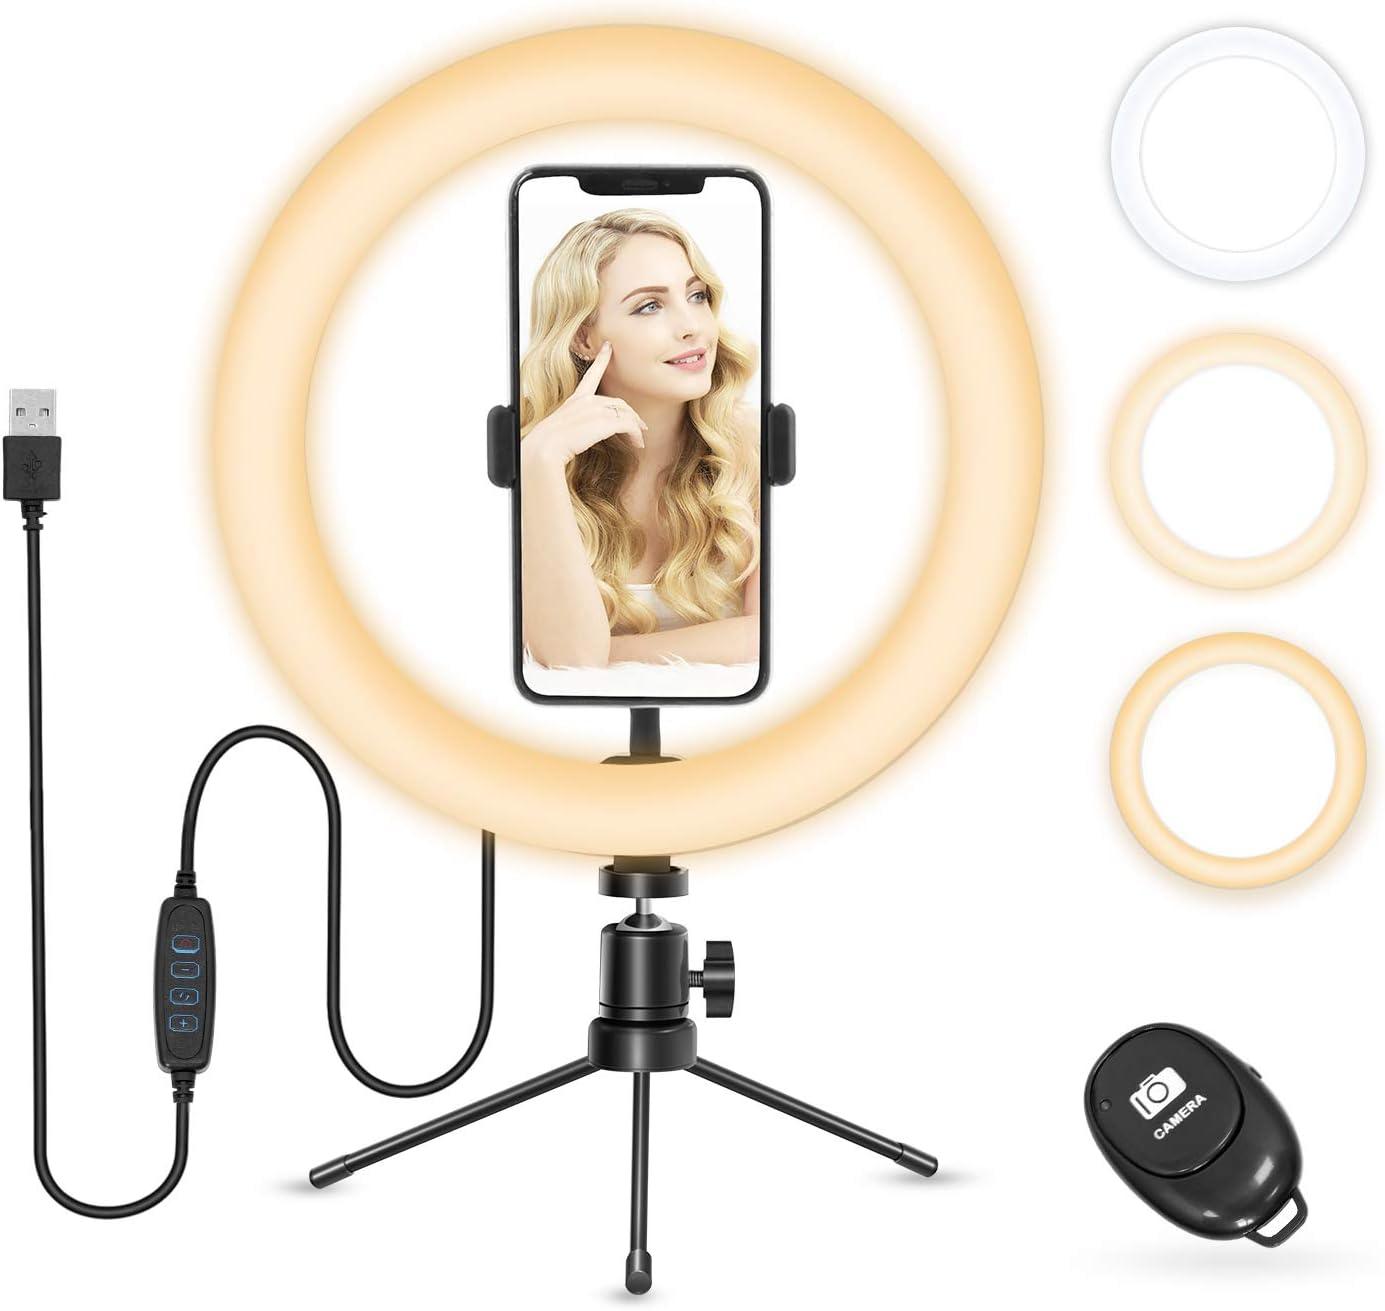 Ringlicht Vamvo Ringleuchte 10 Selfie Led Ring Licht Kamera